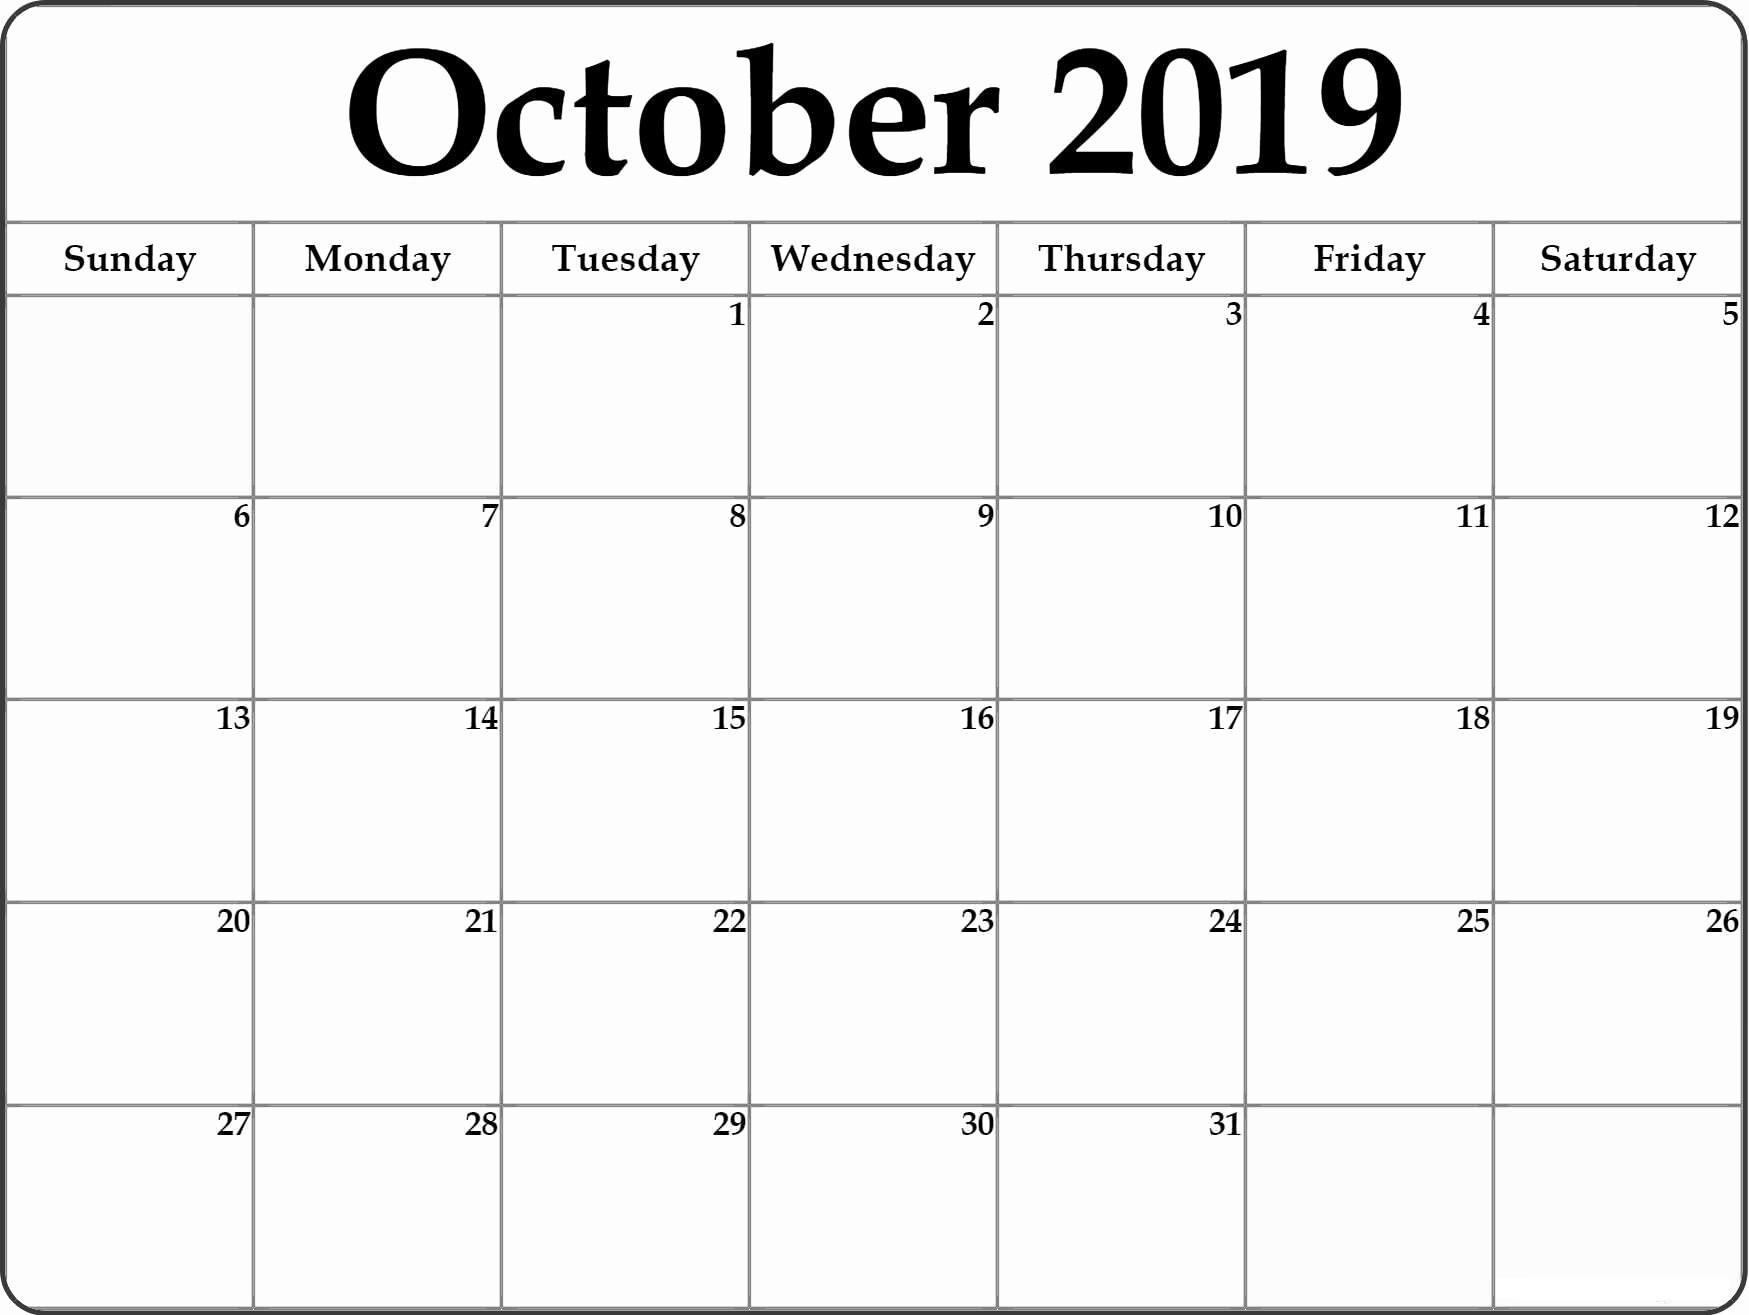 October 2019 Calendar With Holidays Planner - Print Calendar